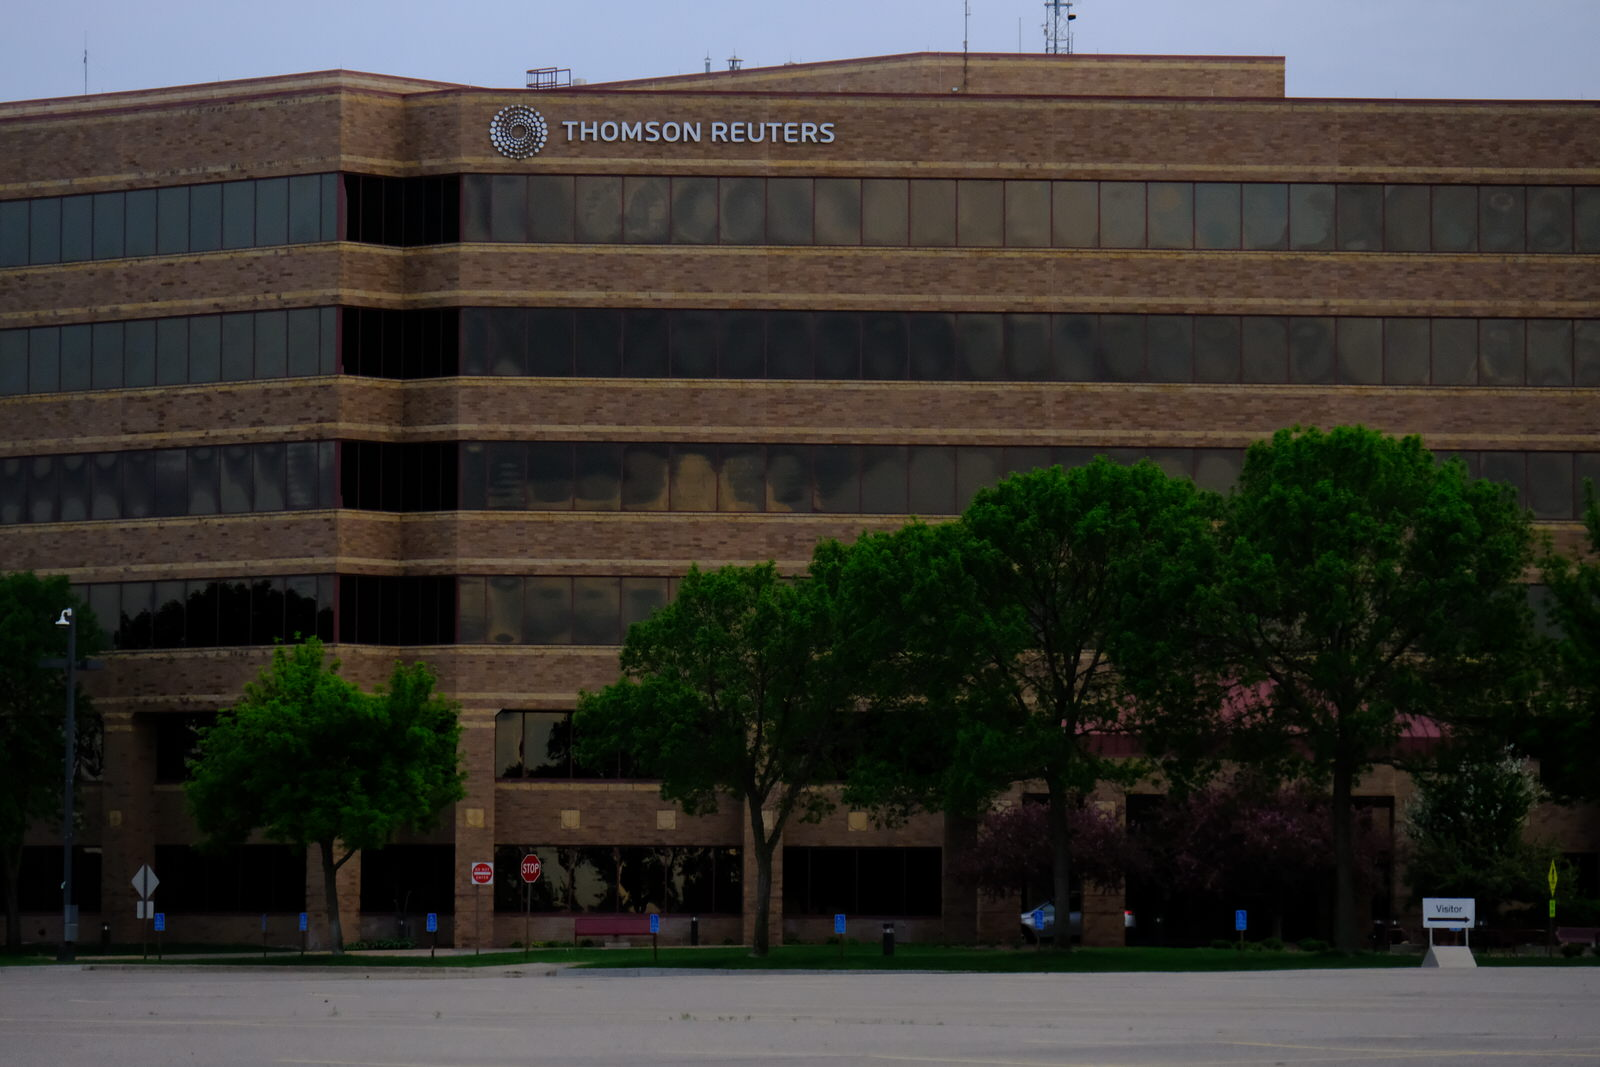 Thomson Reuters' office in Eagan, Minnesota.